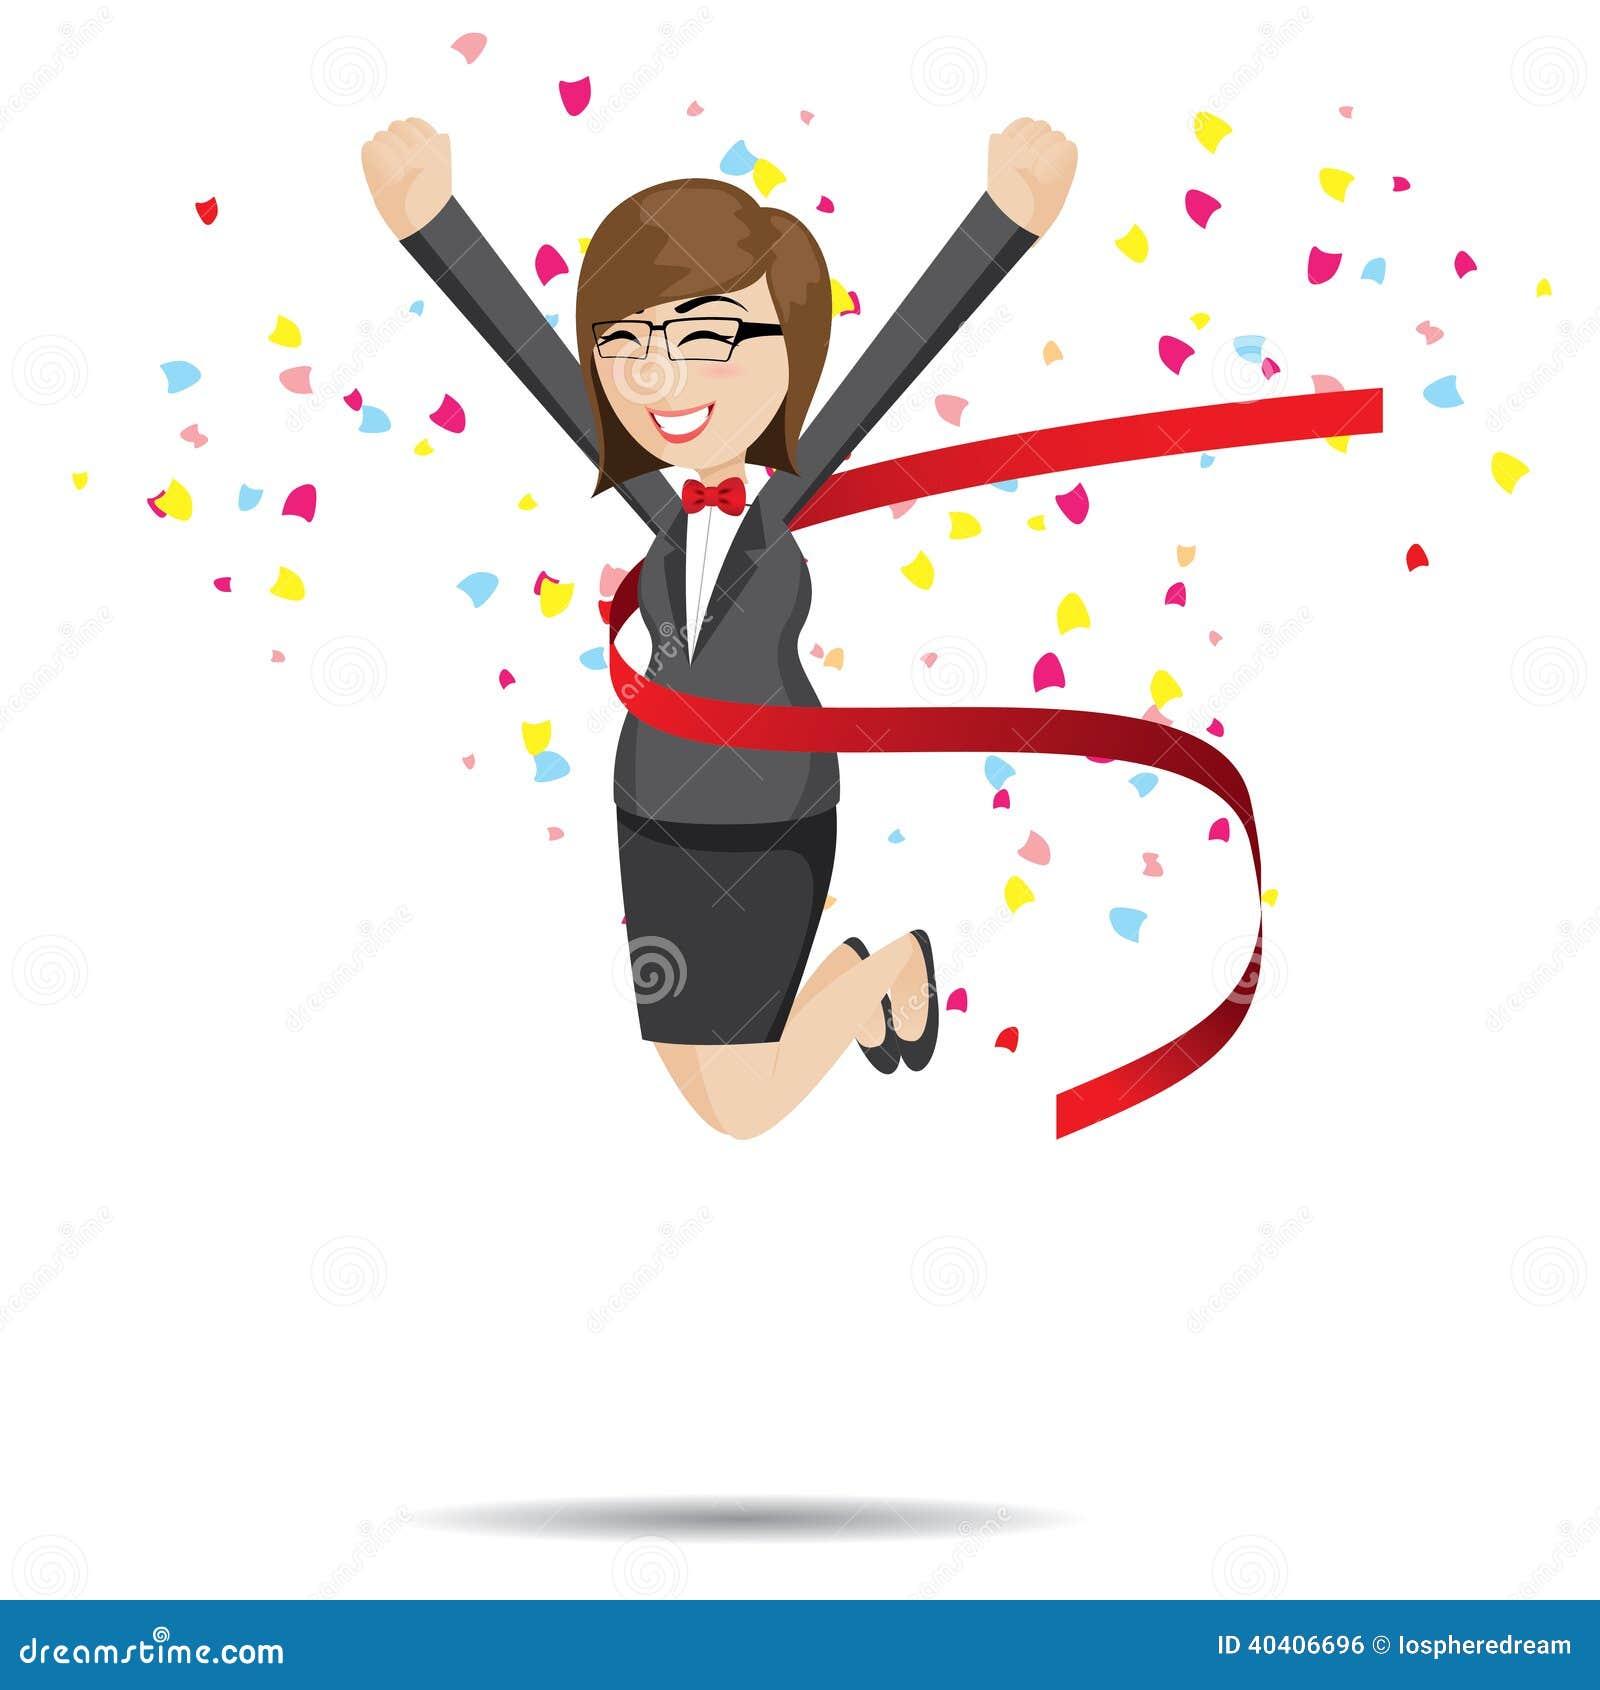 Cartoon Businesswoman In Success Action Stock Vector - Image: 40406696